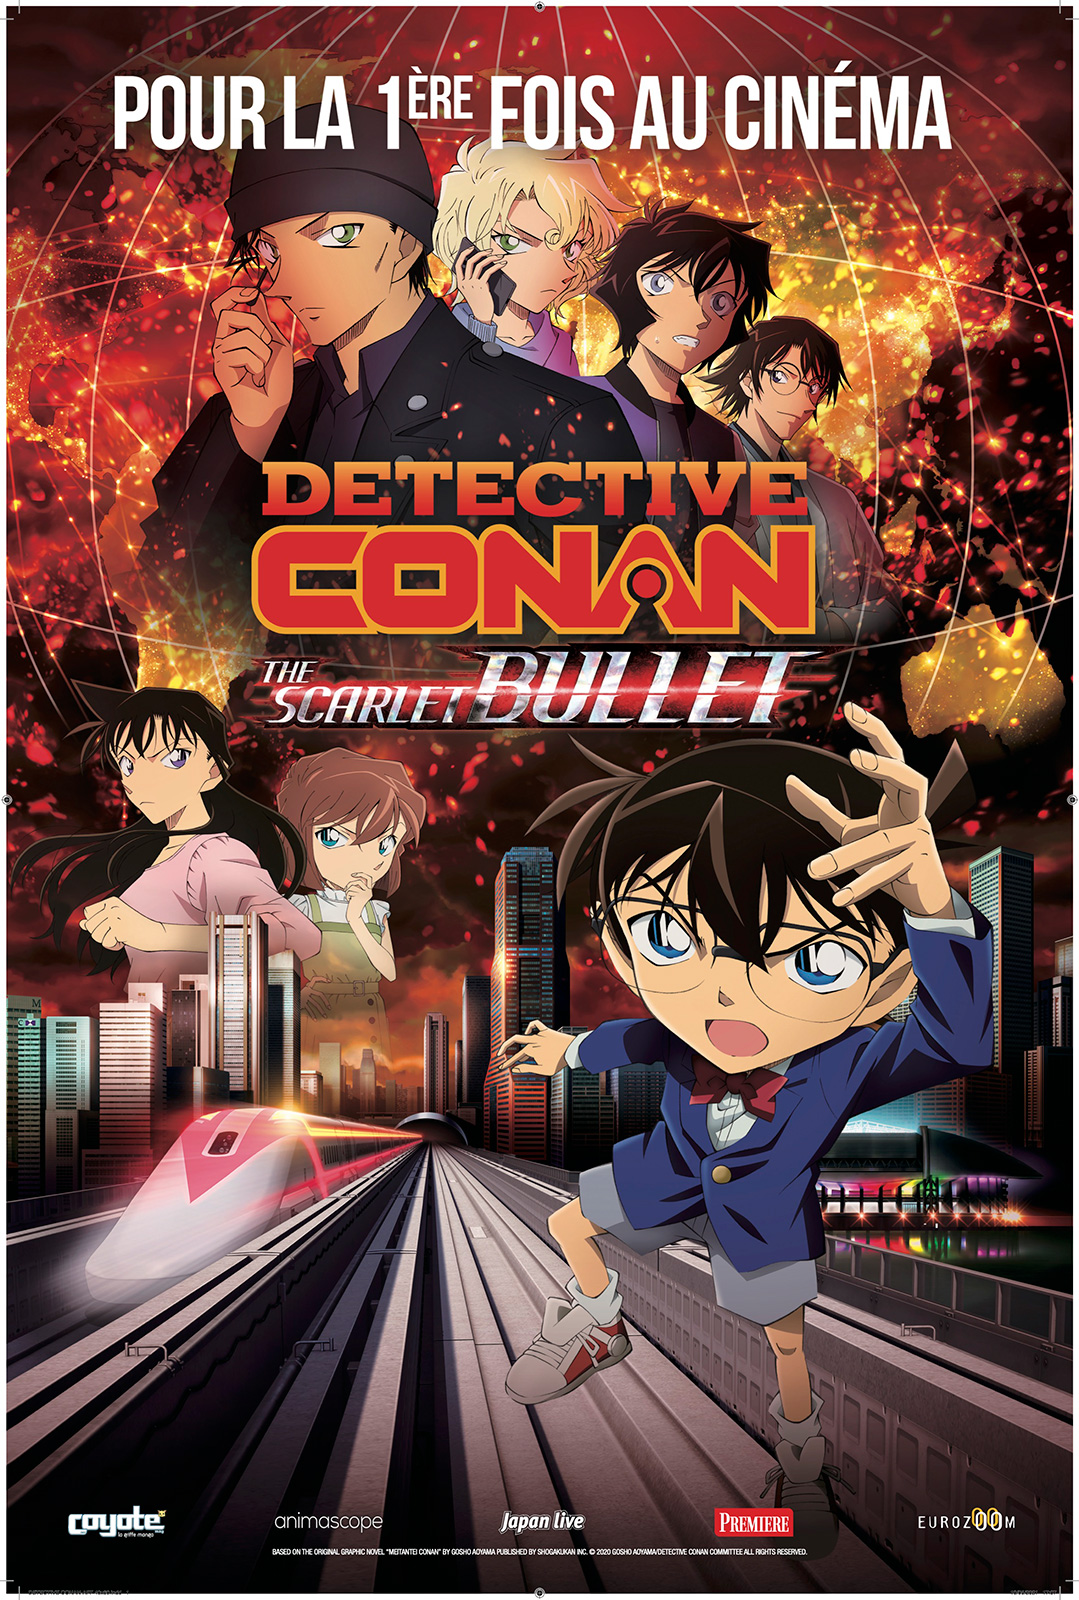 Melun : Detective Conan - The Scarlet Bullet